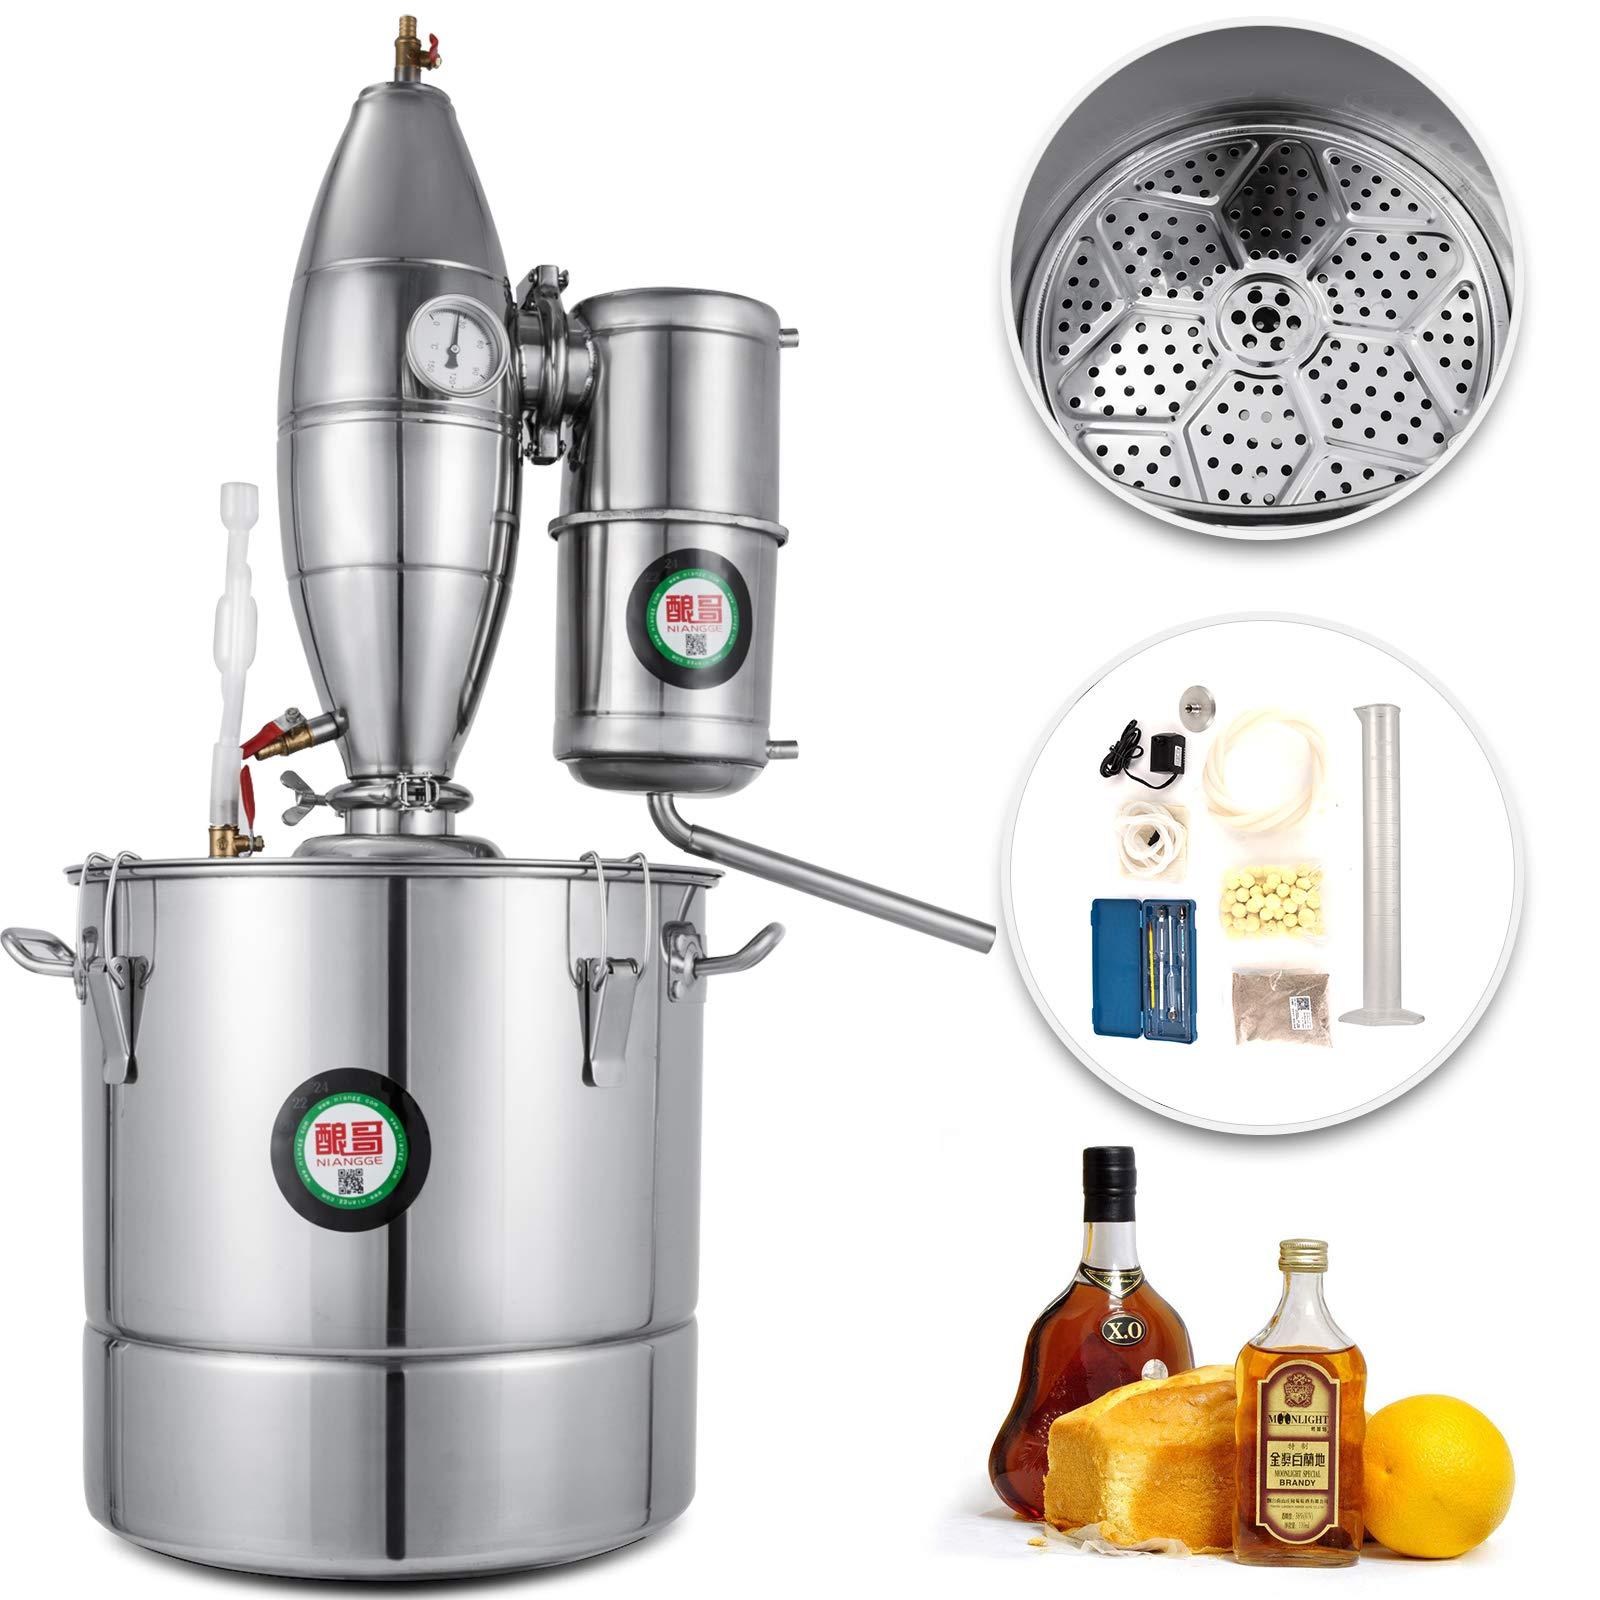 VEVOR 304 Stainless Steel 20L/5.28Gal Water Alcohol Distiller Home Kit Moonshine Wine Making Boiler with Thermometer 20L Distiller 20L Distiller